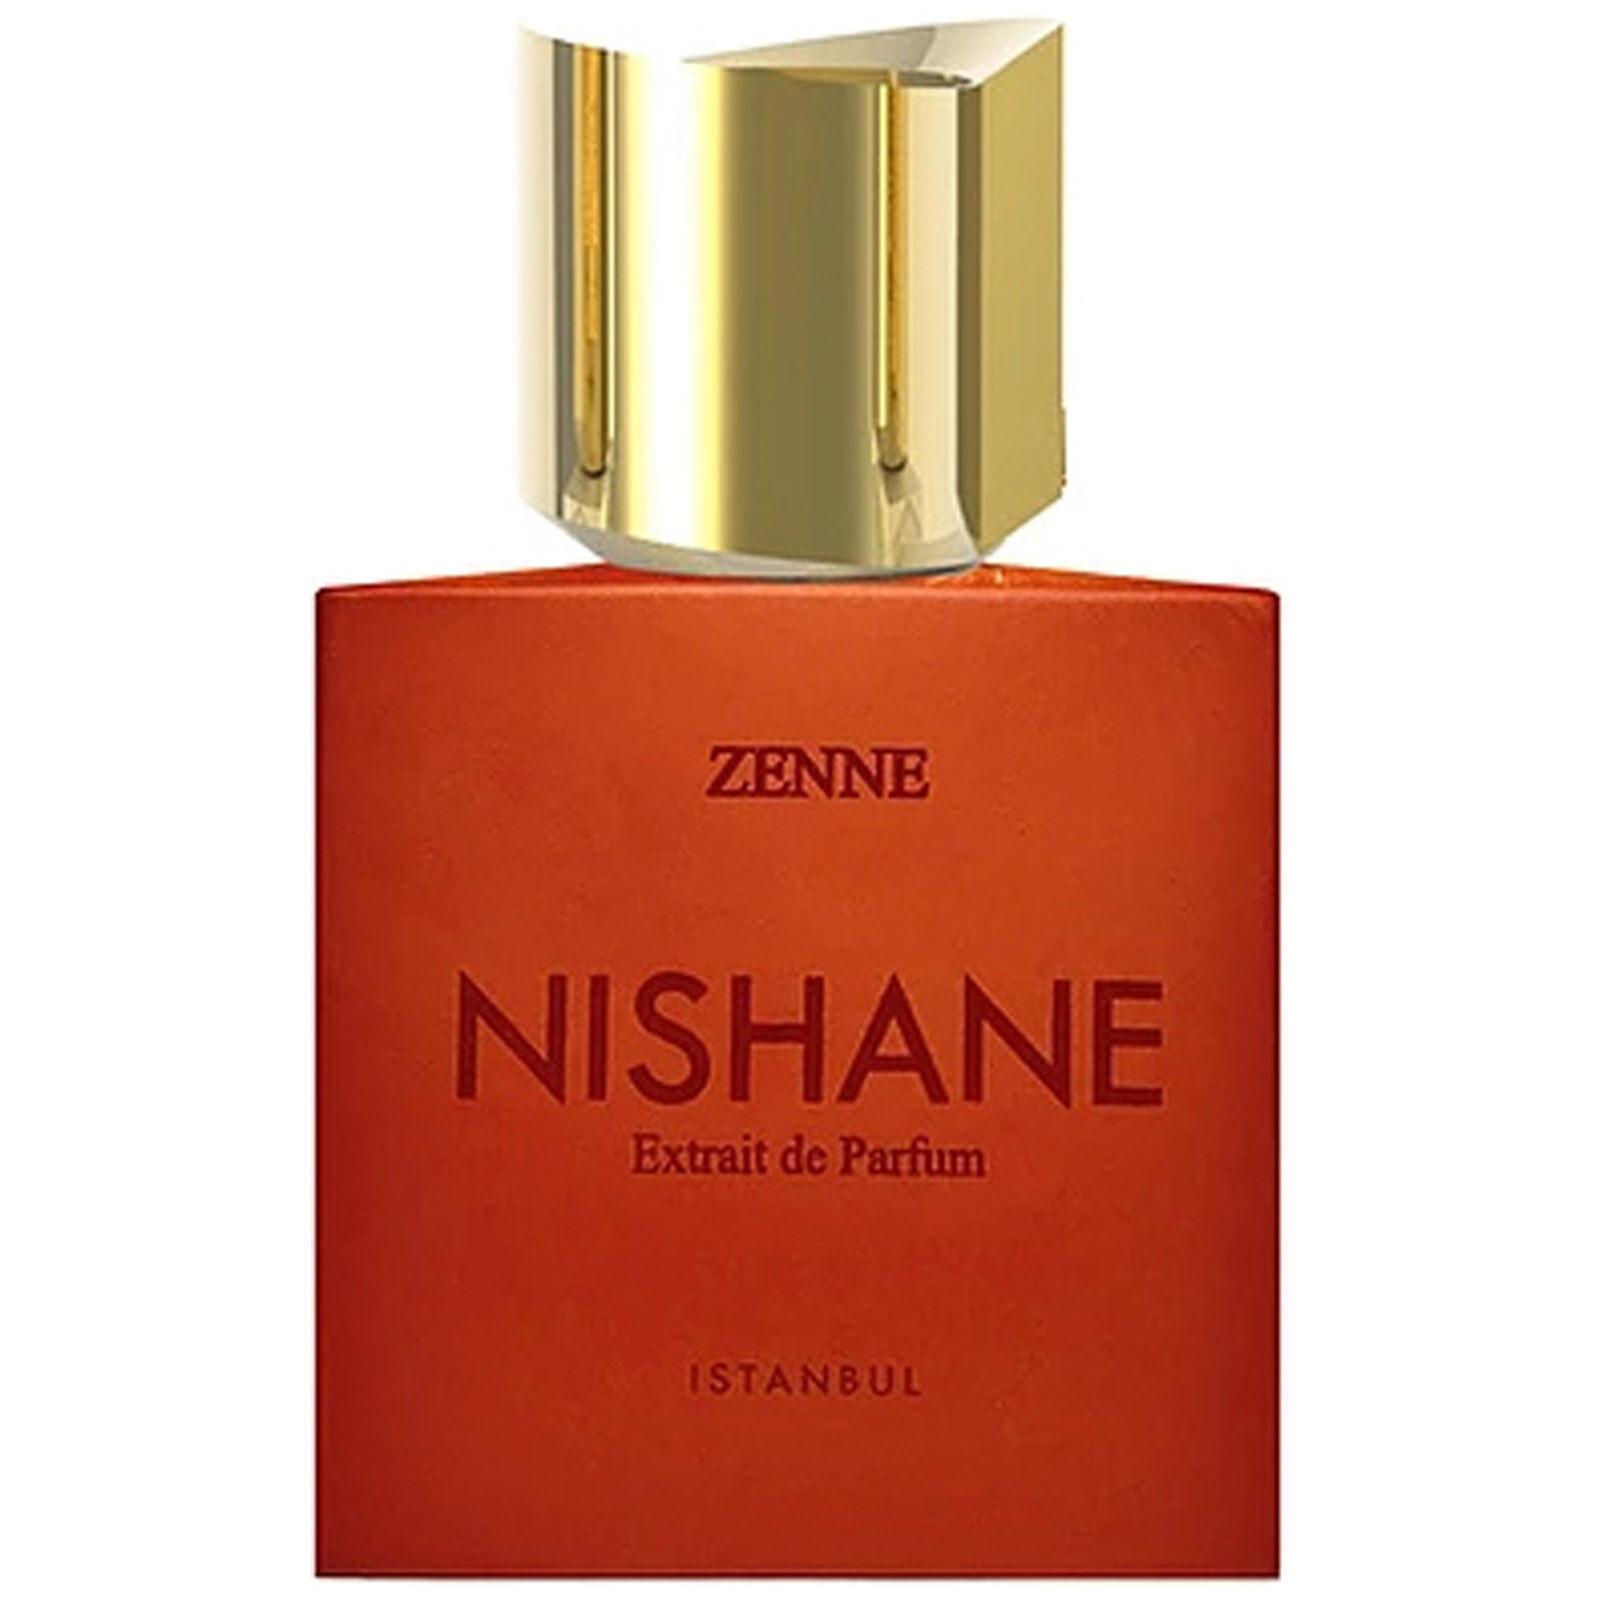 Nishane Istanbul Zenne extrait de parfum 55 ml  - White